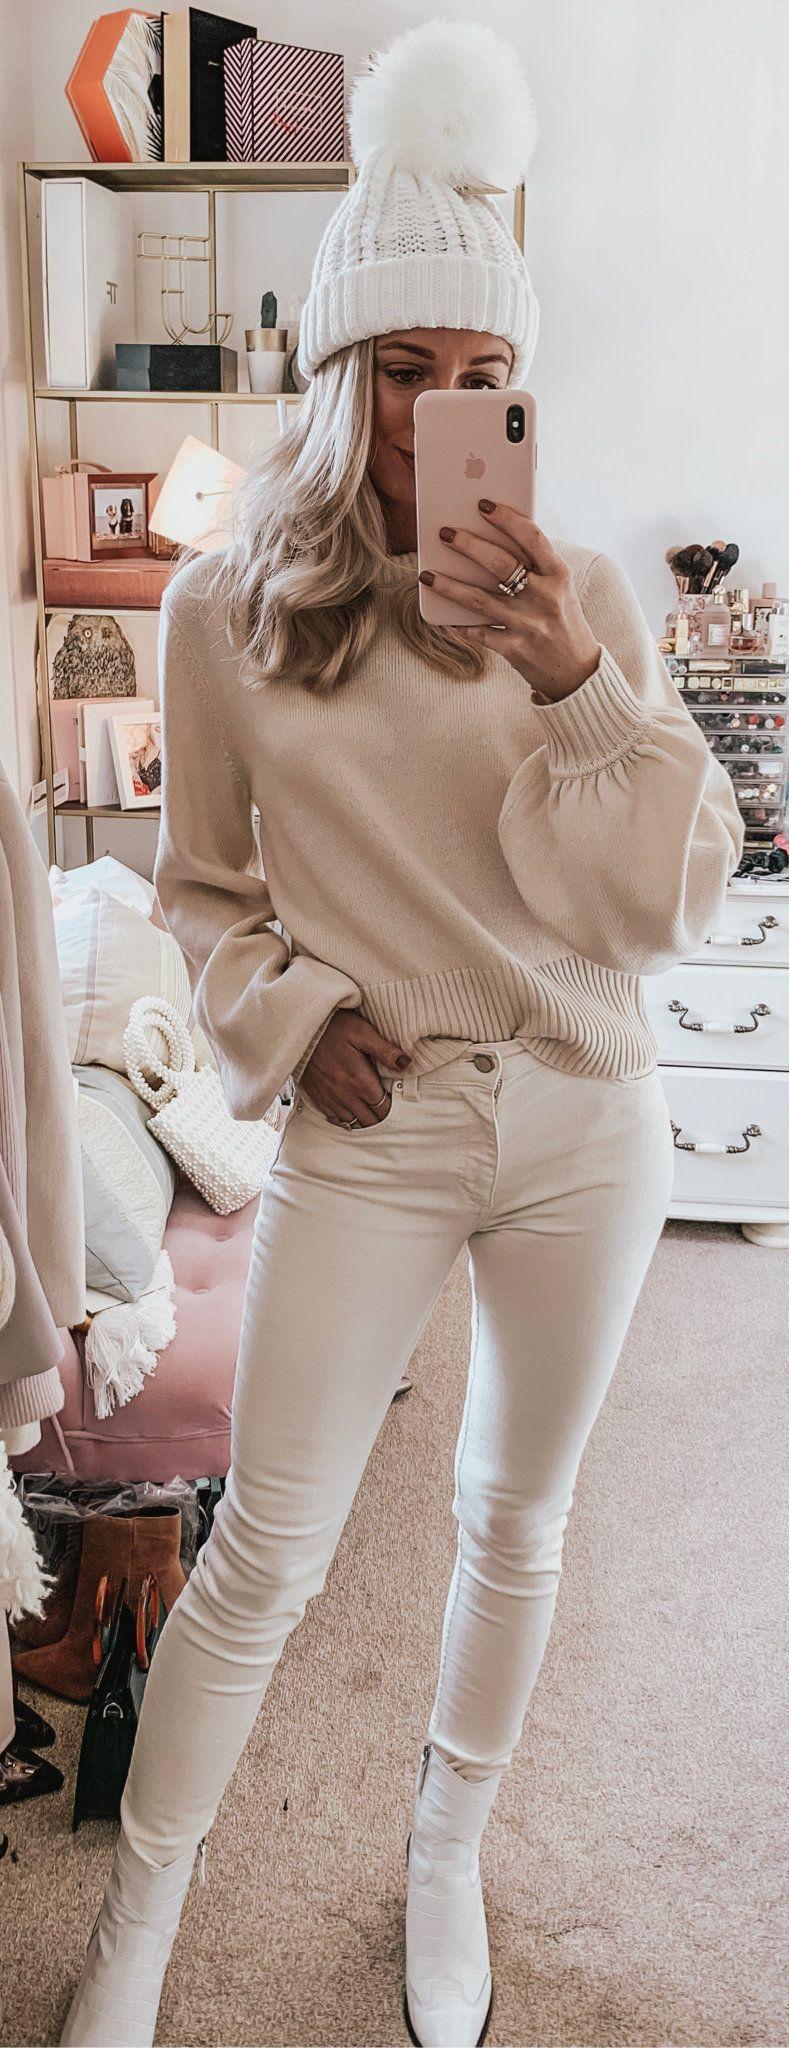 white knit cap